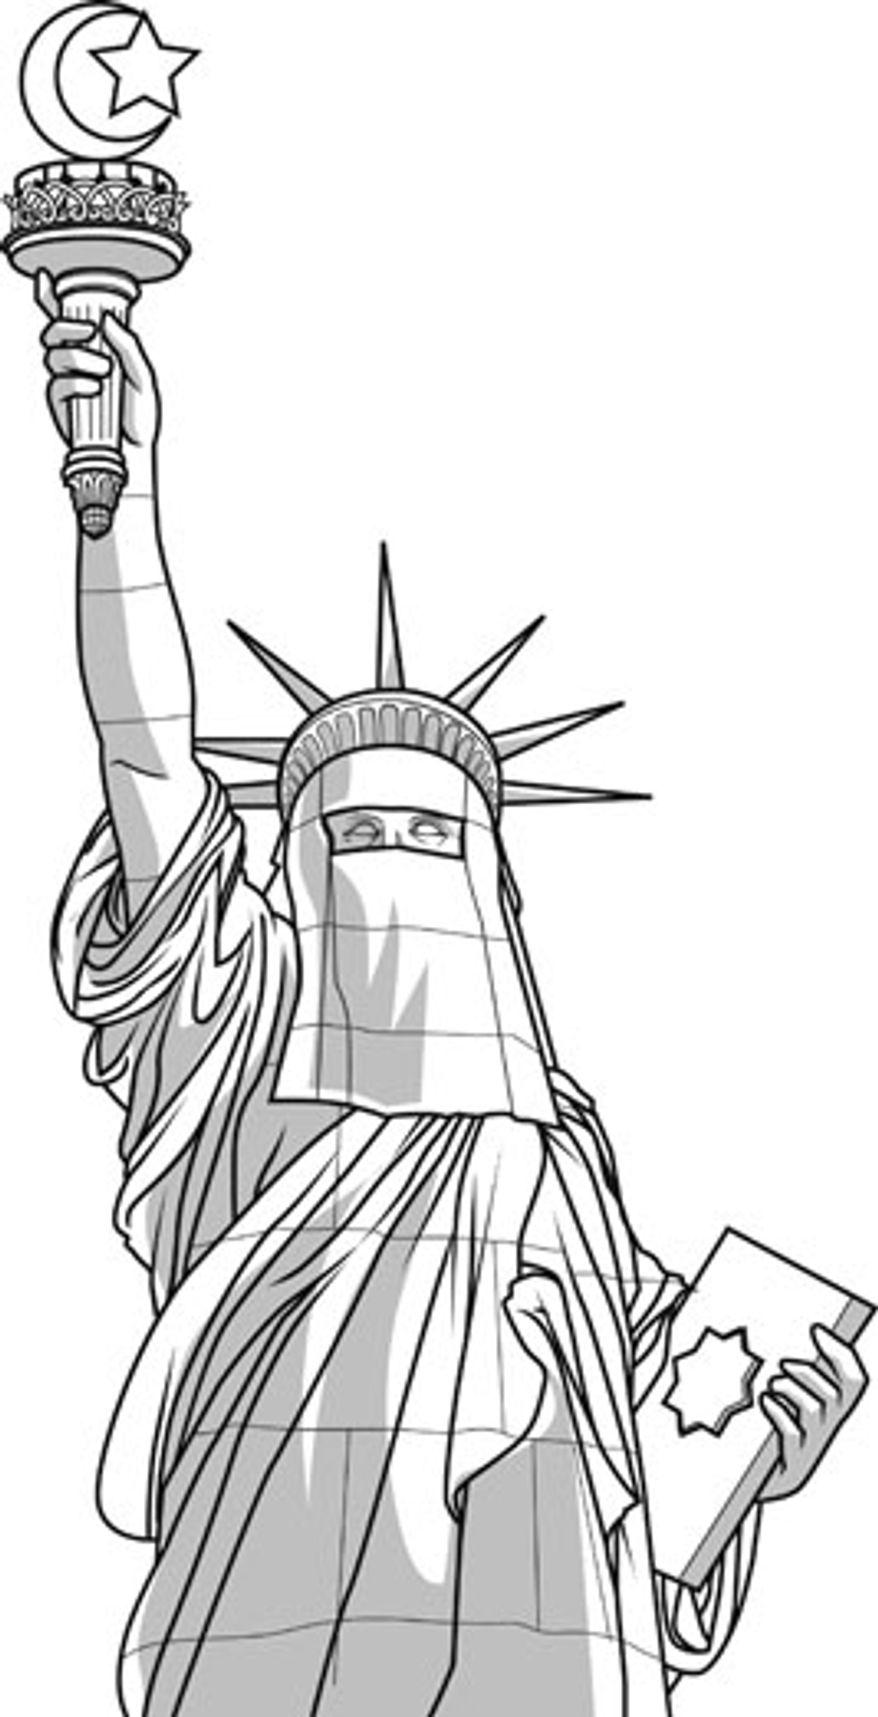 Illustration: Shariah by Linas Garsys for The Washington Times